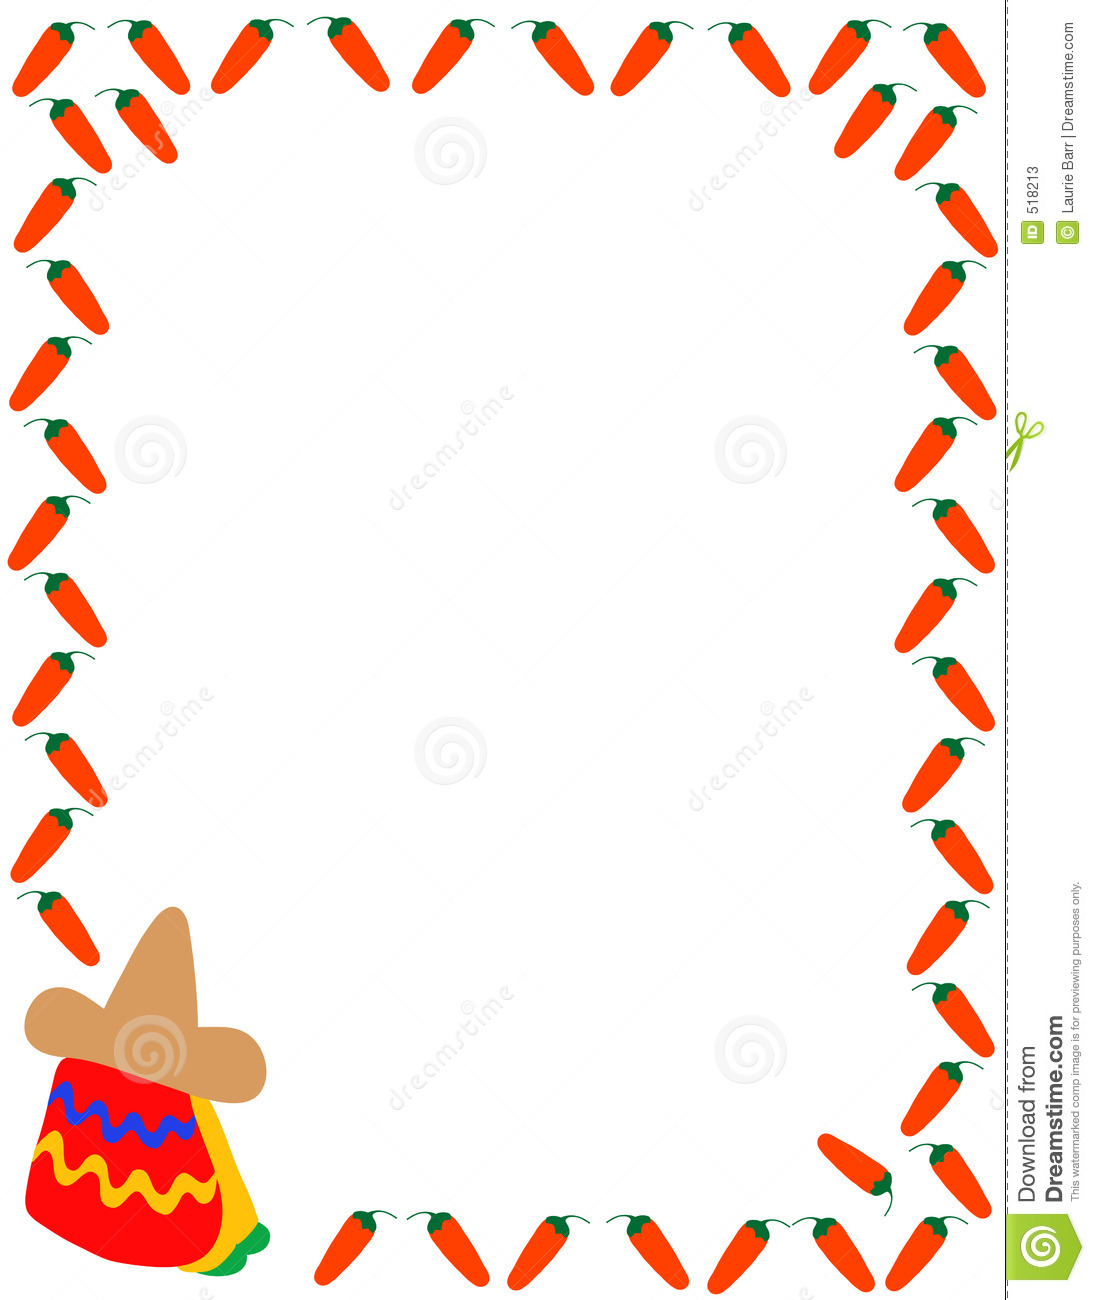 1095x1300 Clip Art Mexican Borders Taco Clipart Border Pencil And In Color